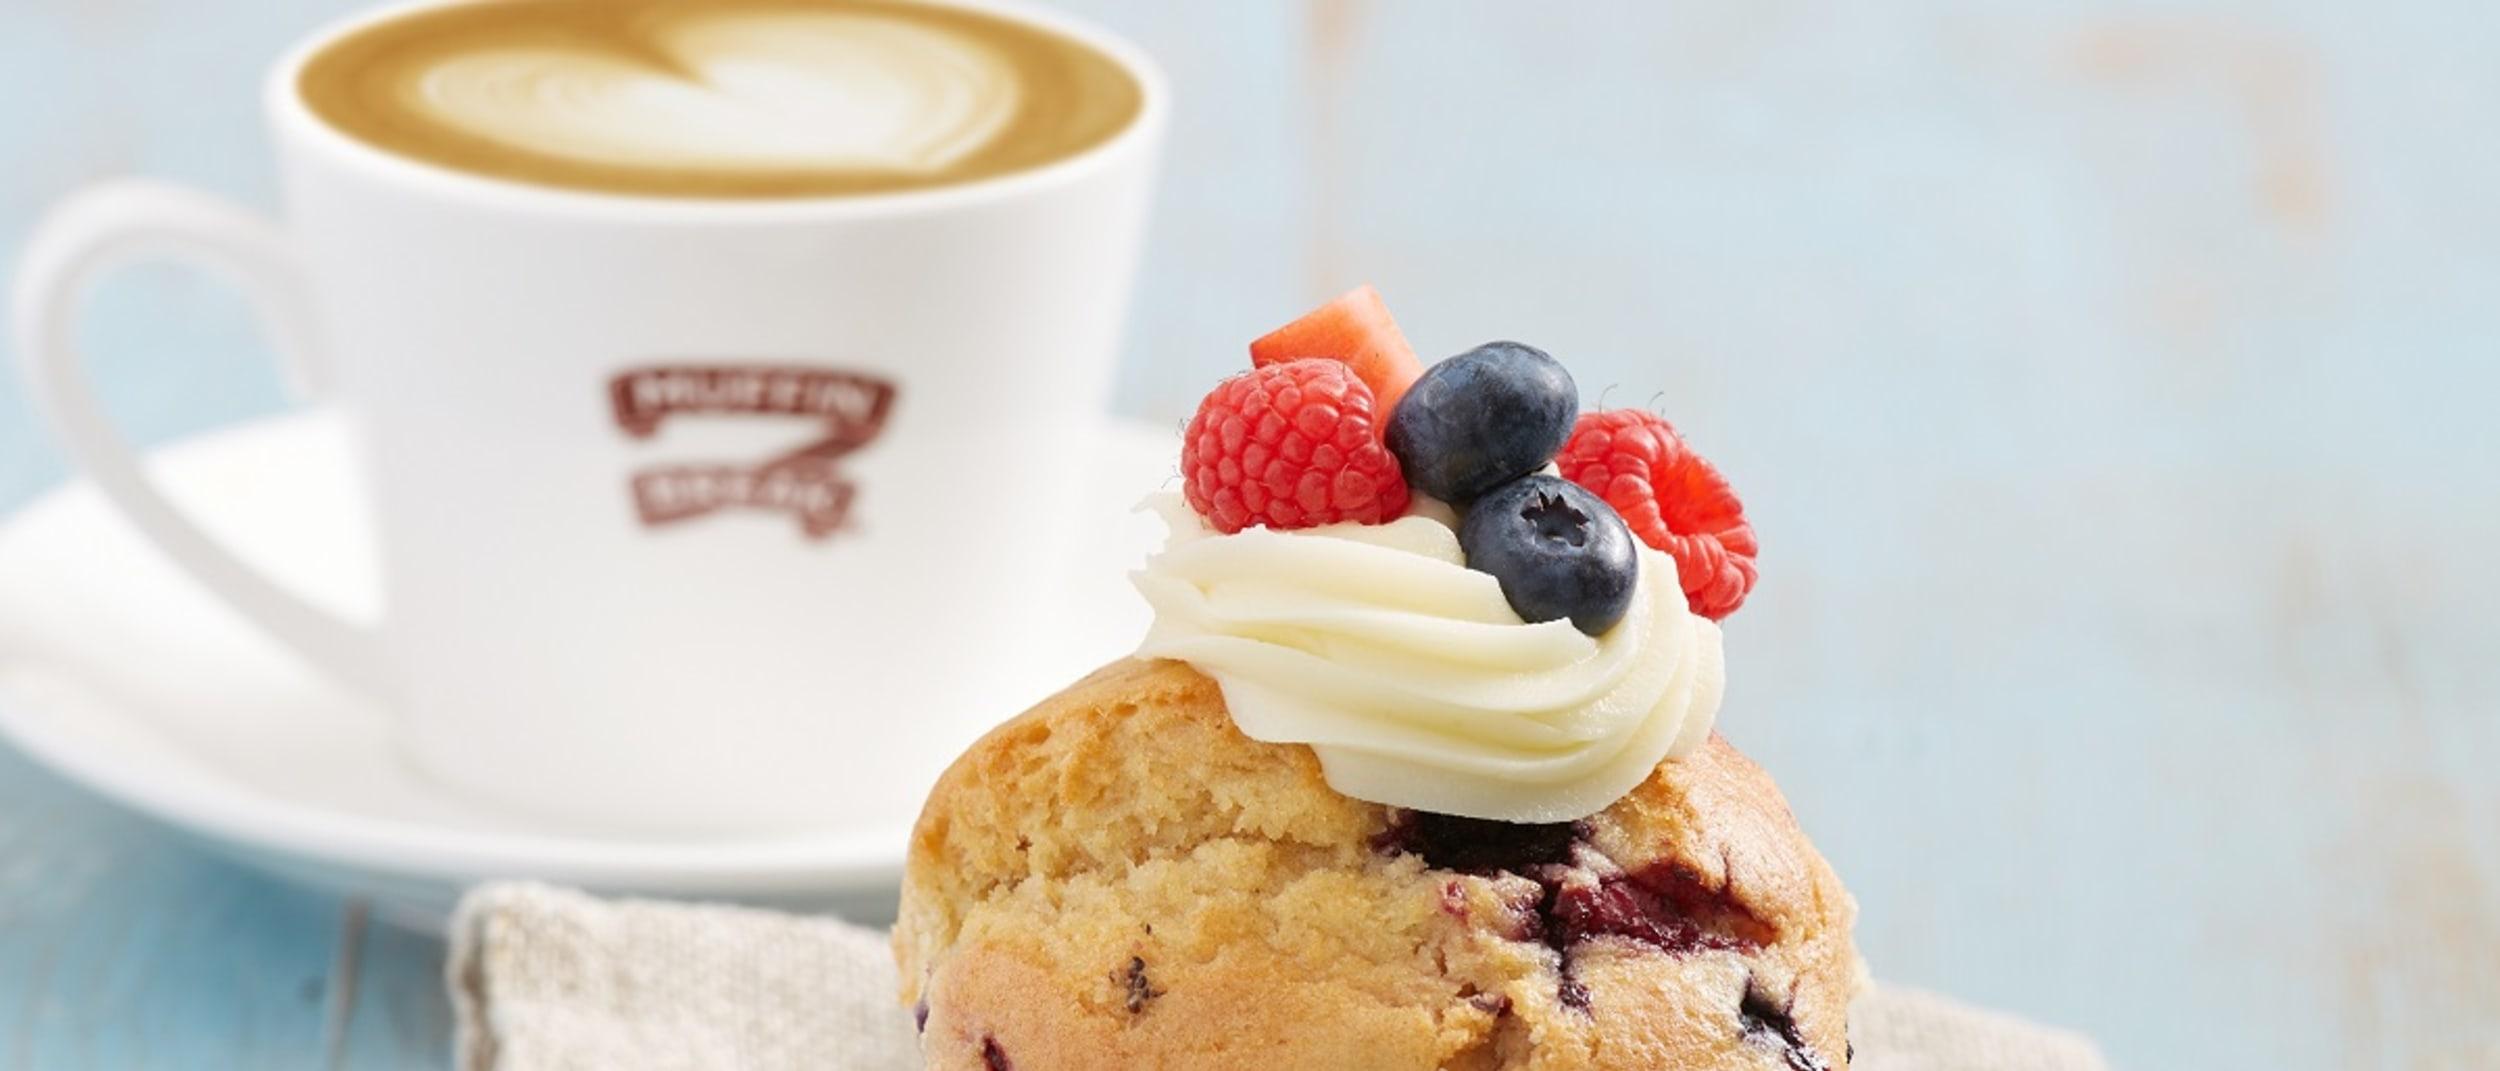 Muffin Break have won best sustainability initiative